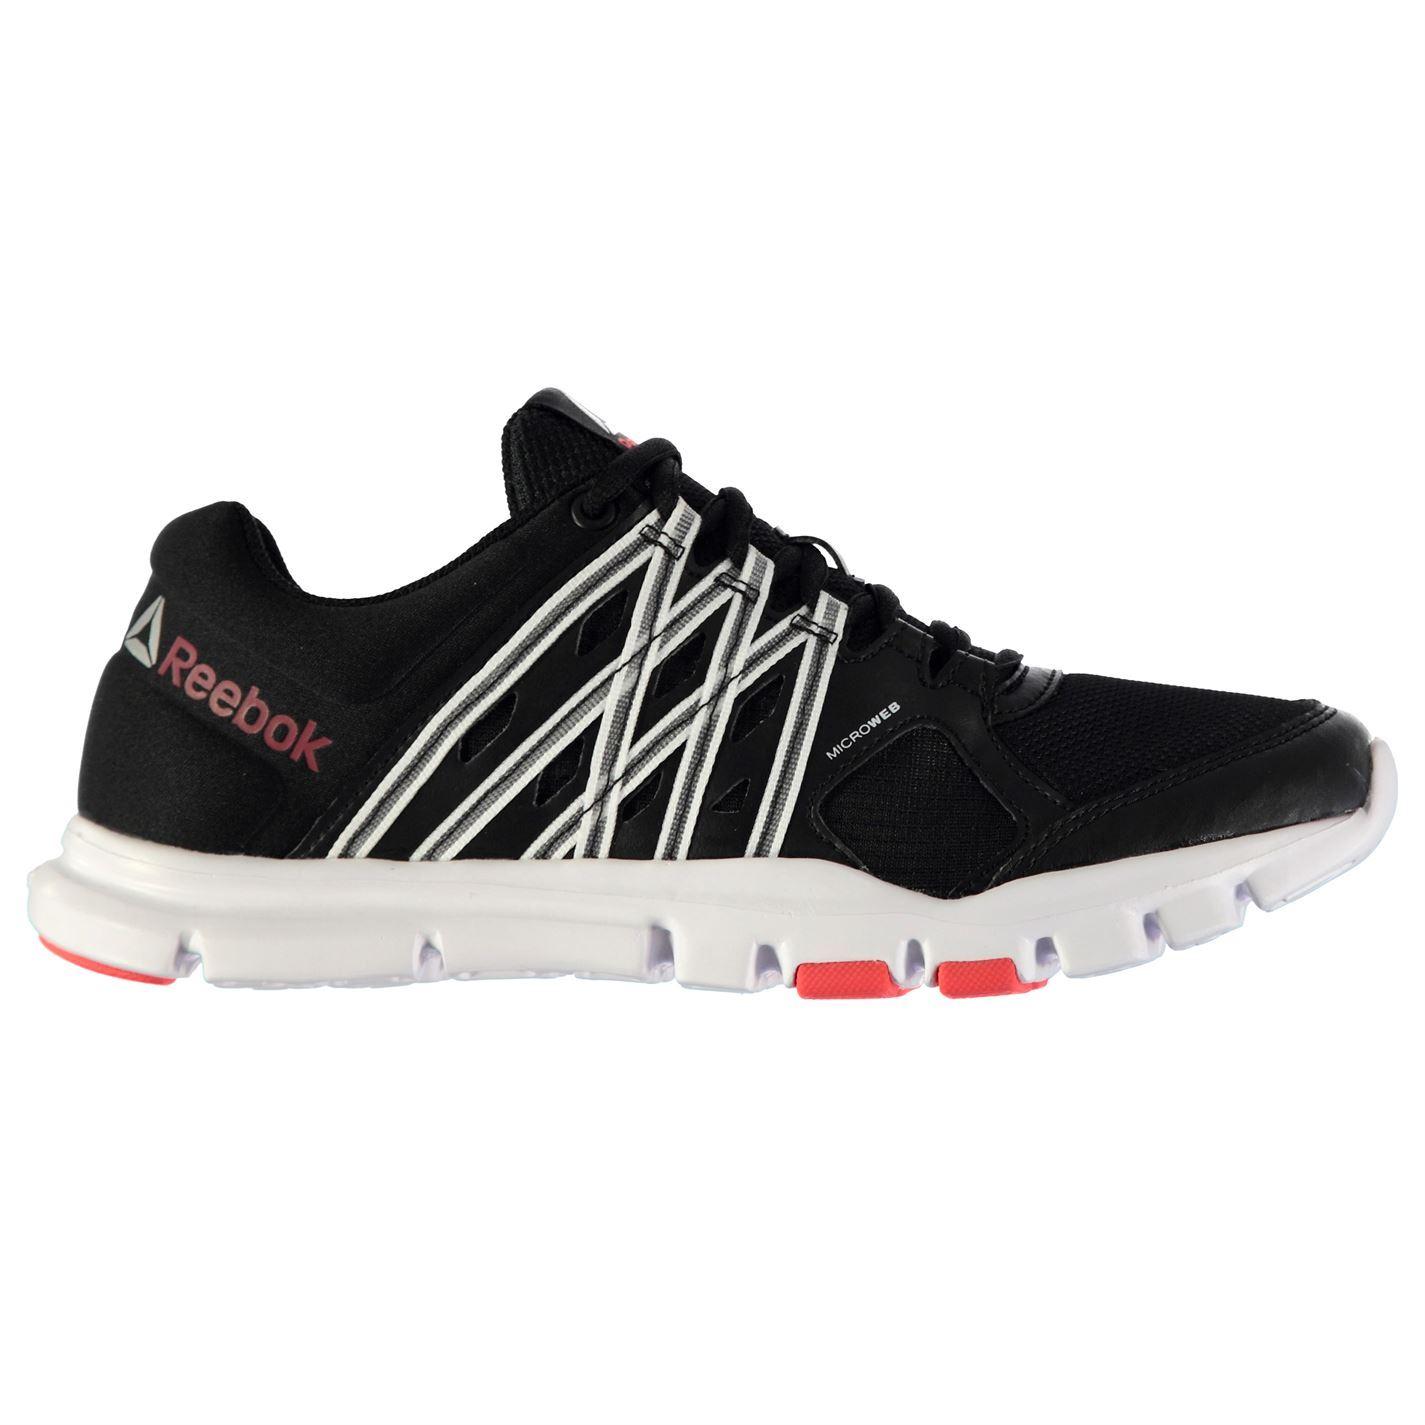 Details about Reebok YourFlex Trainers Womens BlkWhtCherry Sneakers Sports Shoes Footwear